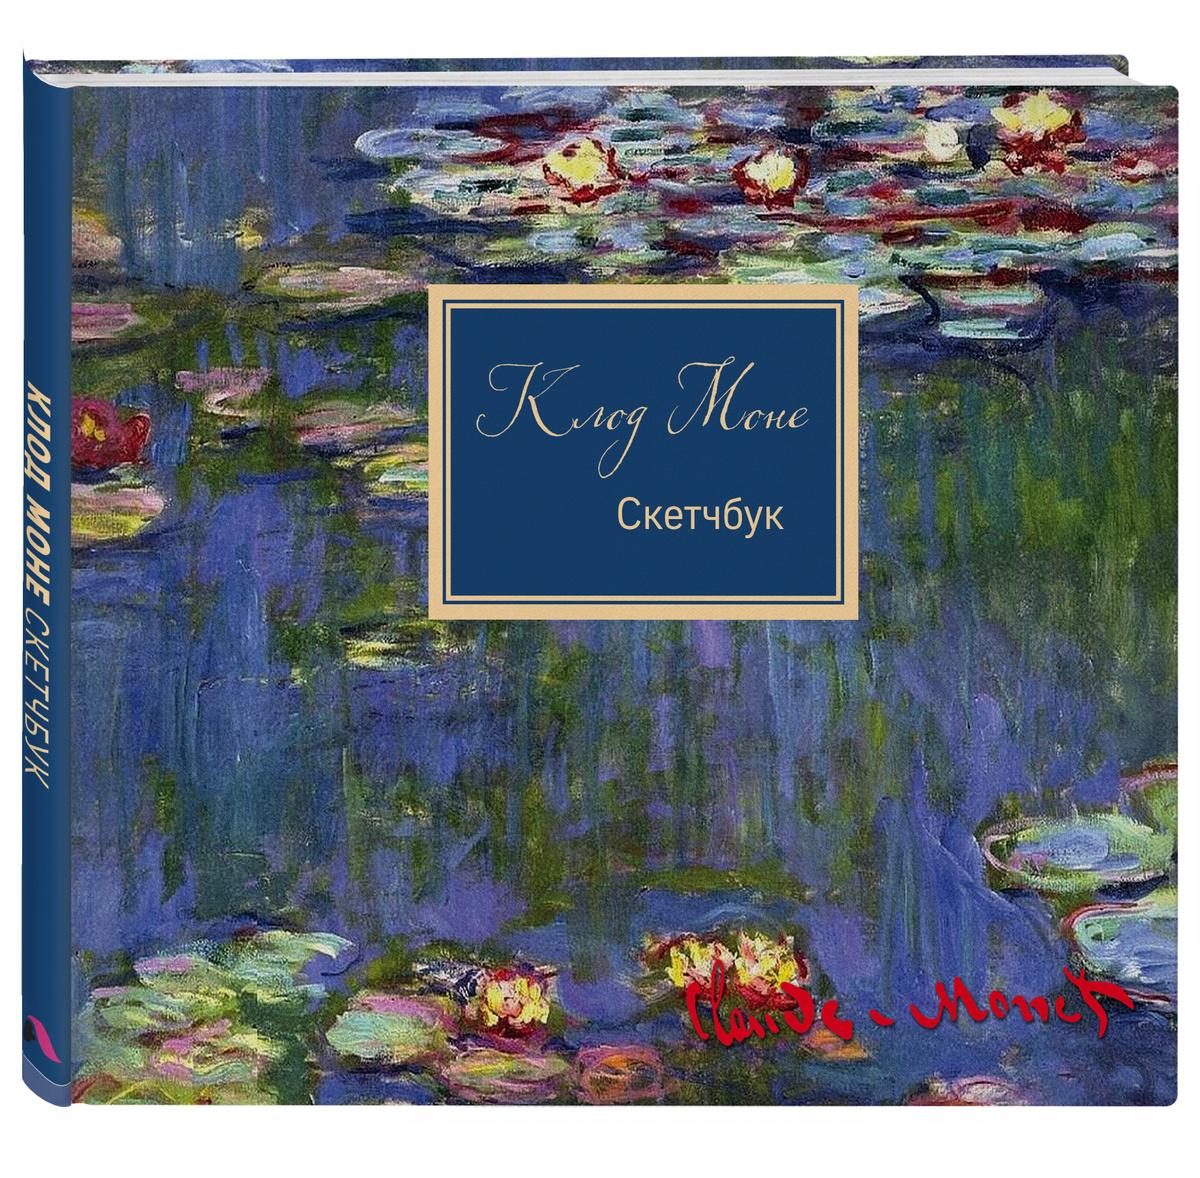 Скетчбук. Клод Моне (твёрдый переплёт, 96 стр., 240х200 мм) | Нет автора  #1